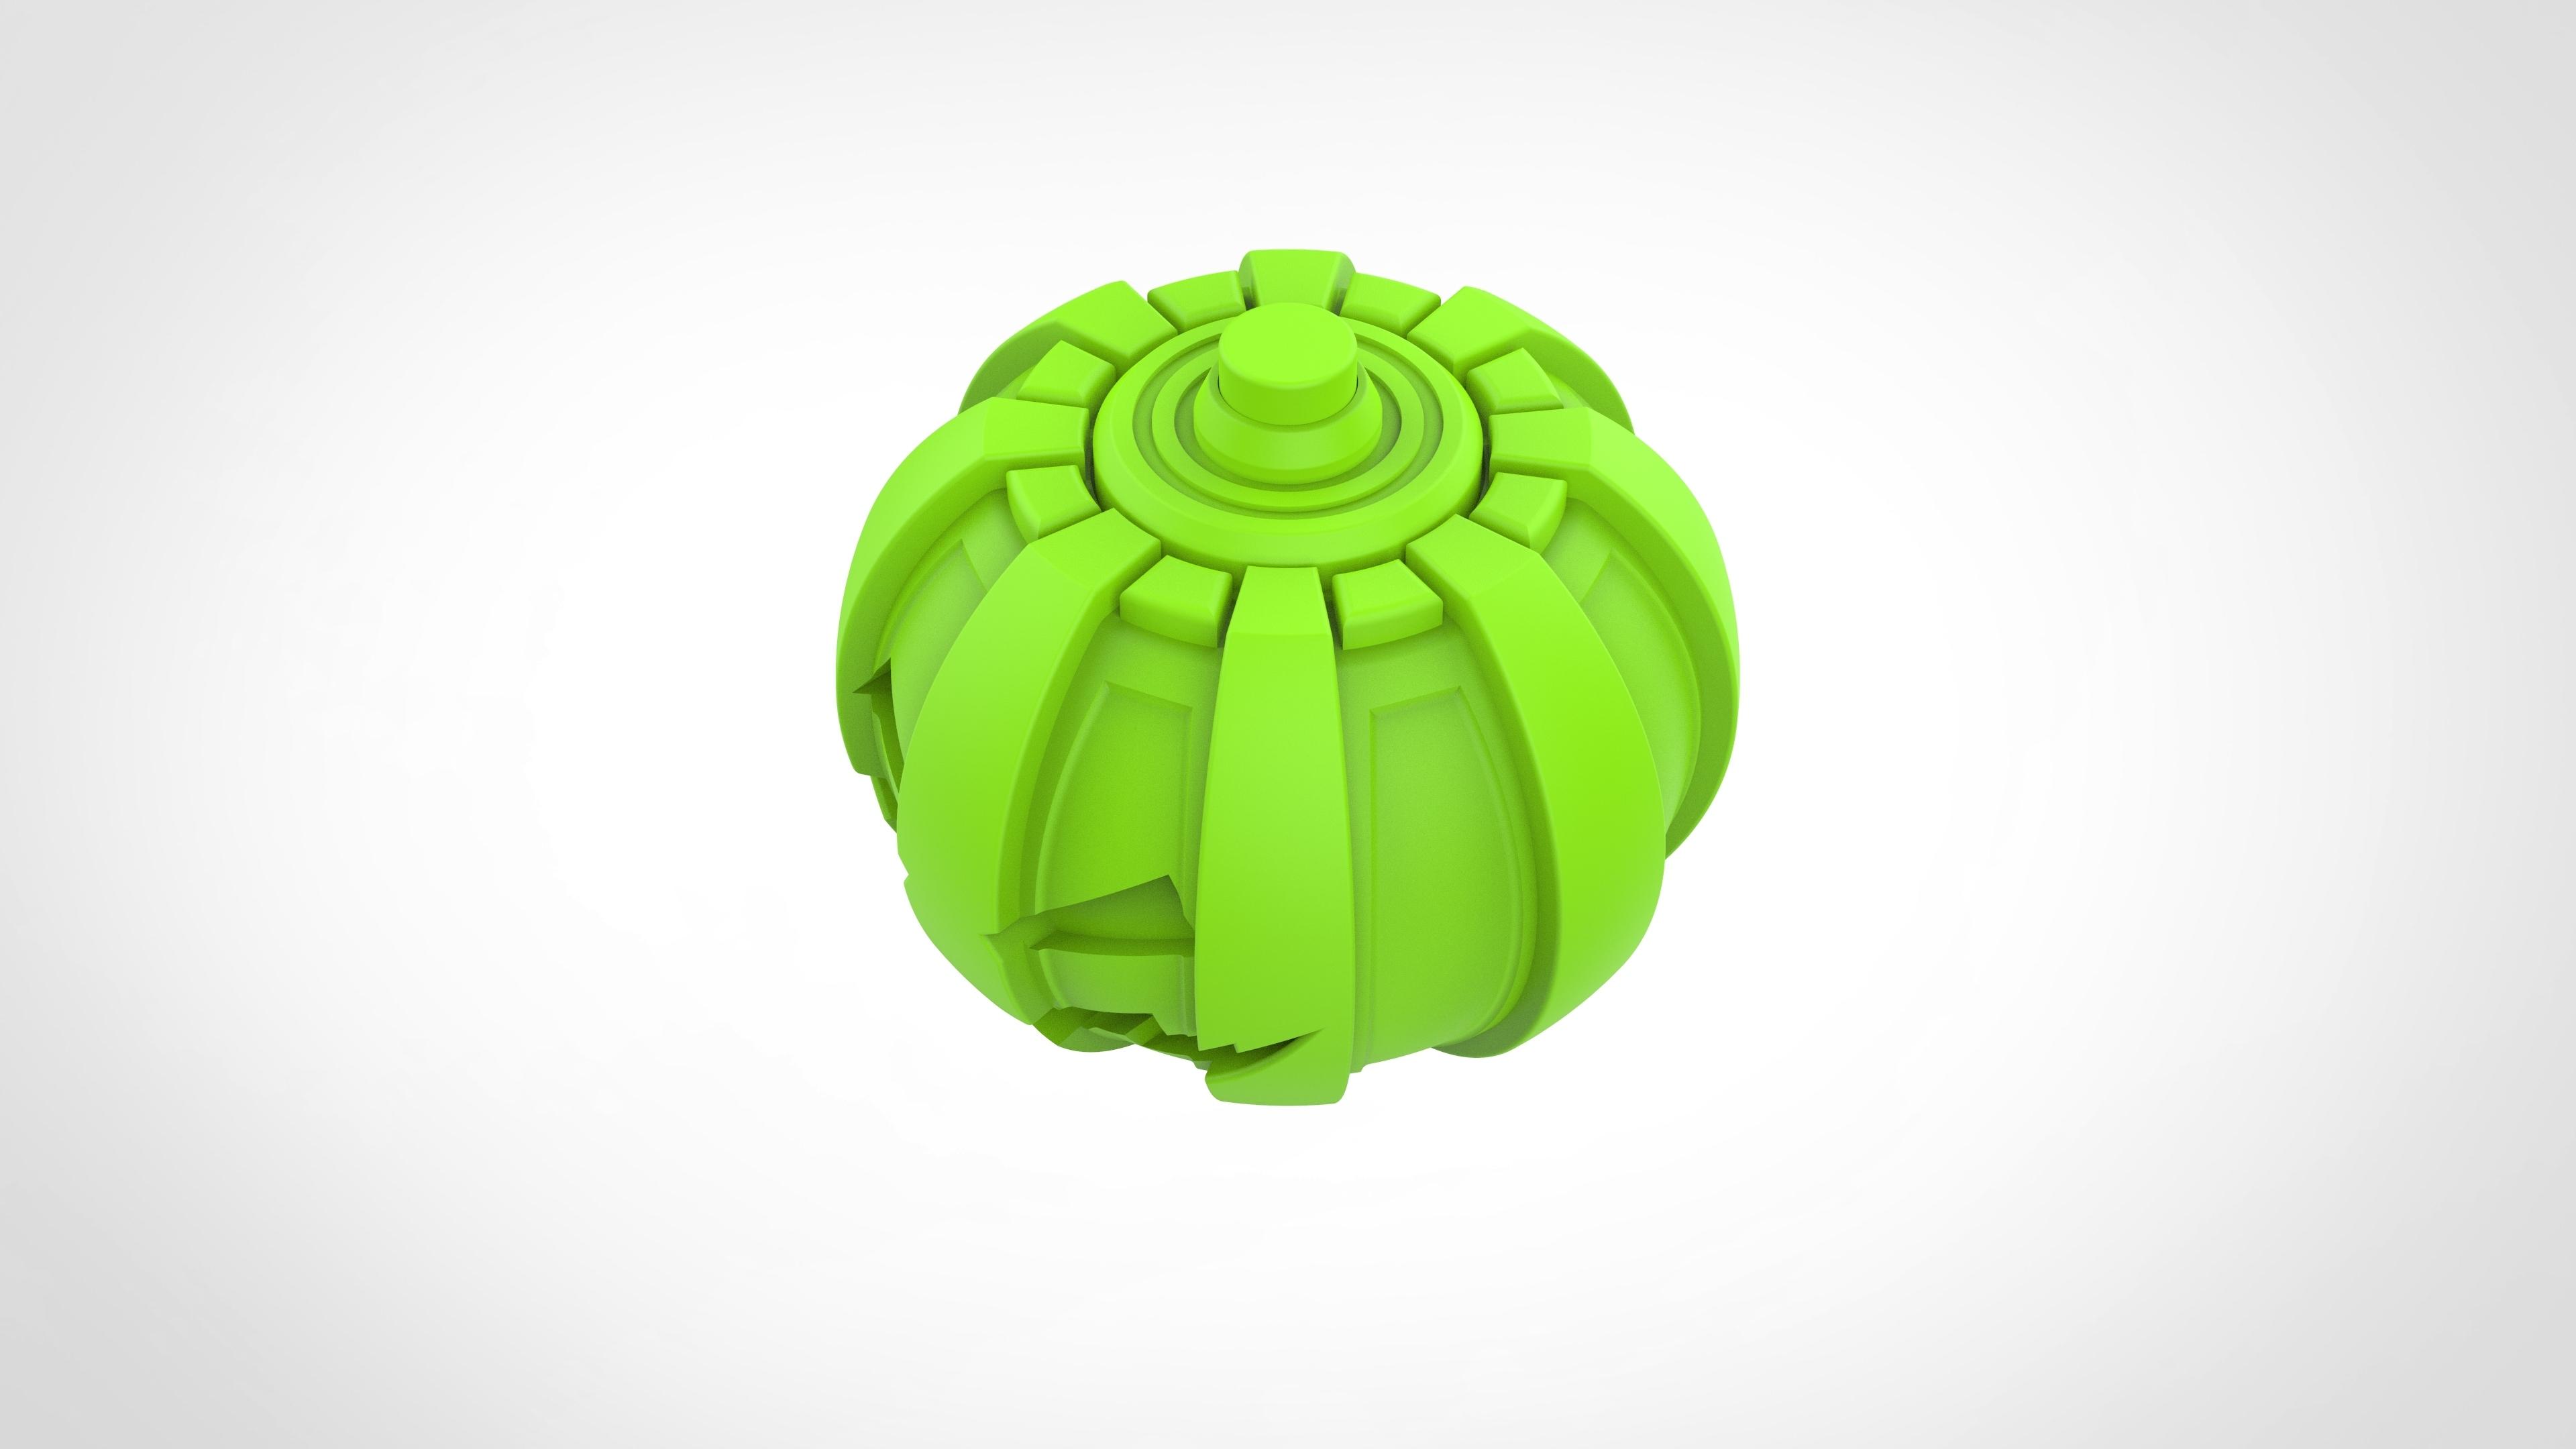 018.jpg Download 3MF file Green goblin bombs from the Spide-Man comics • 3D print model, vetrock